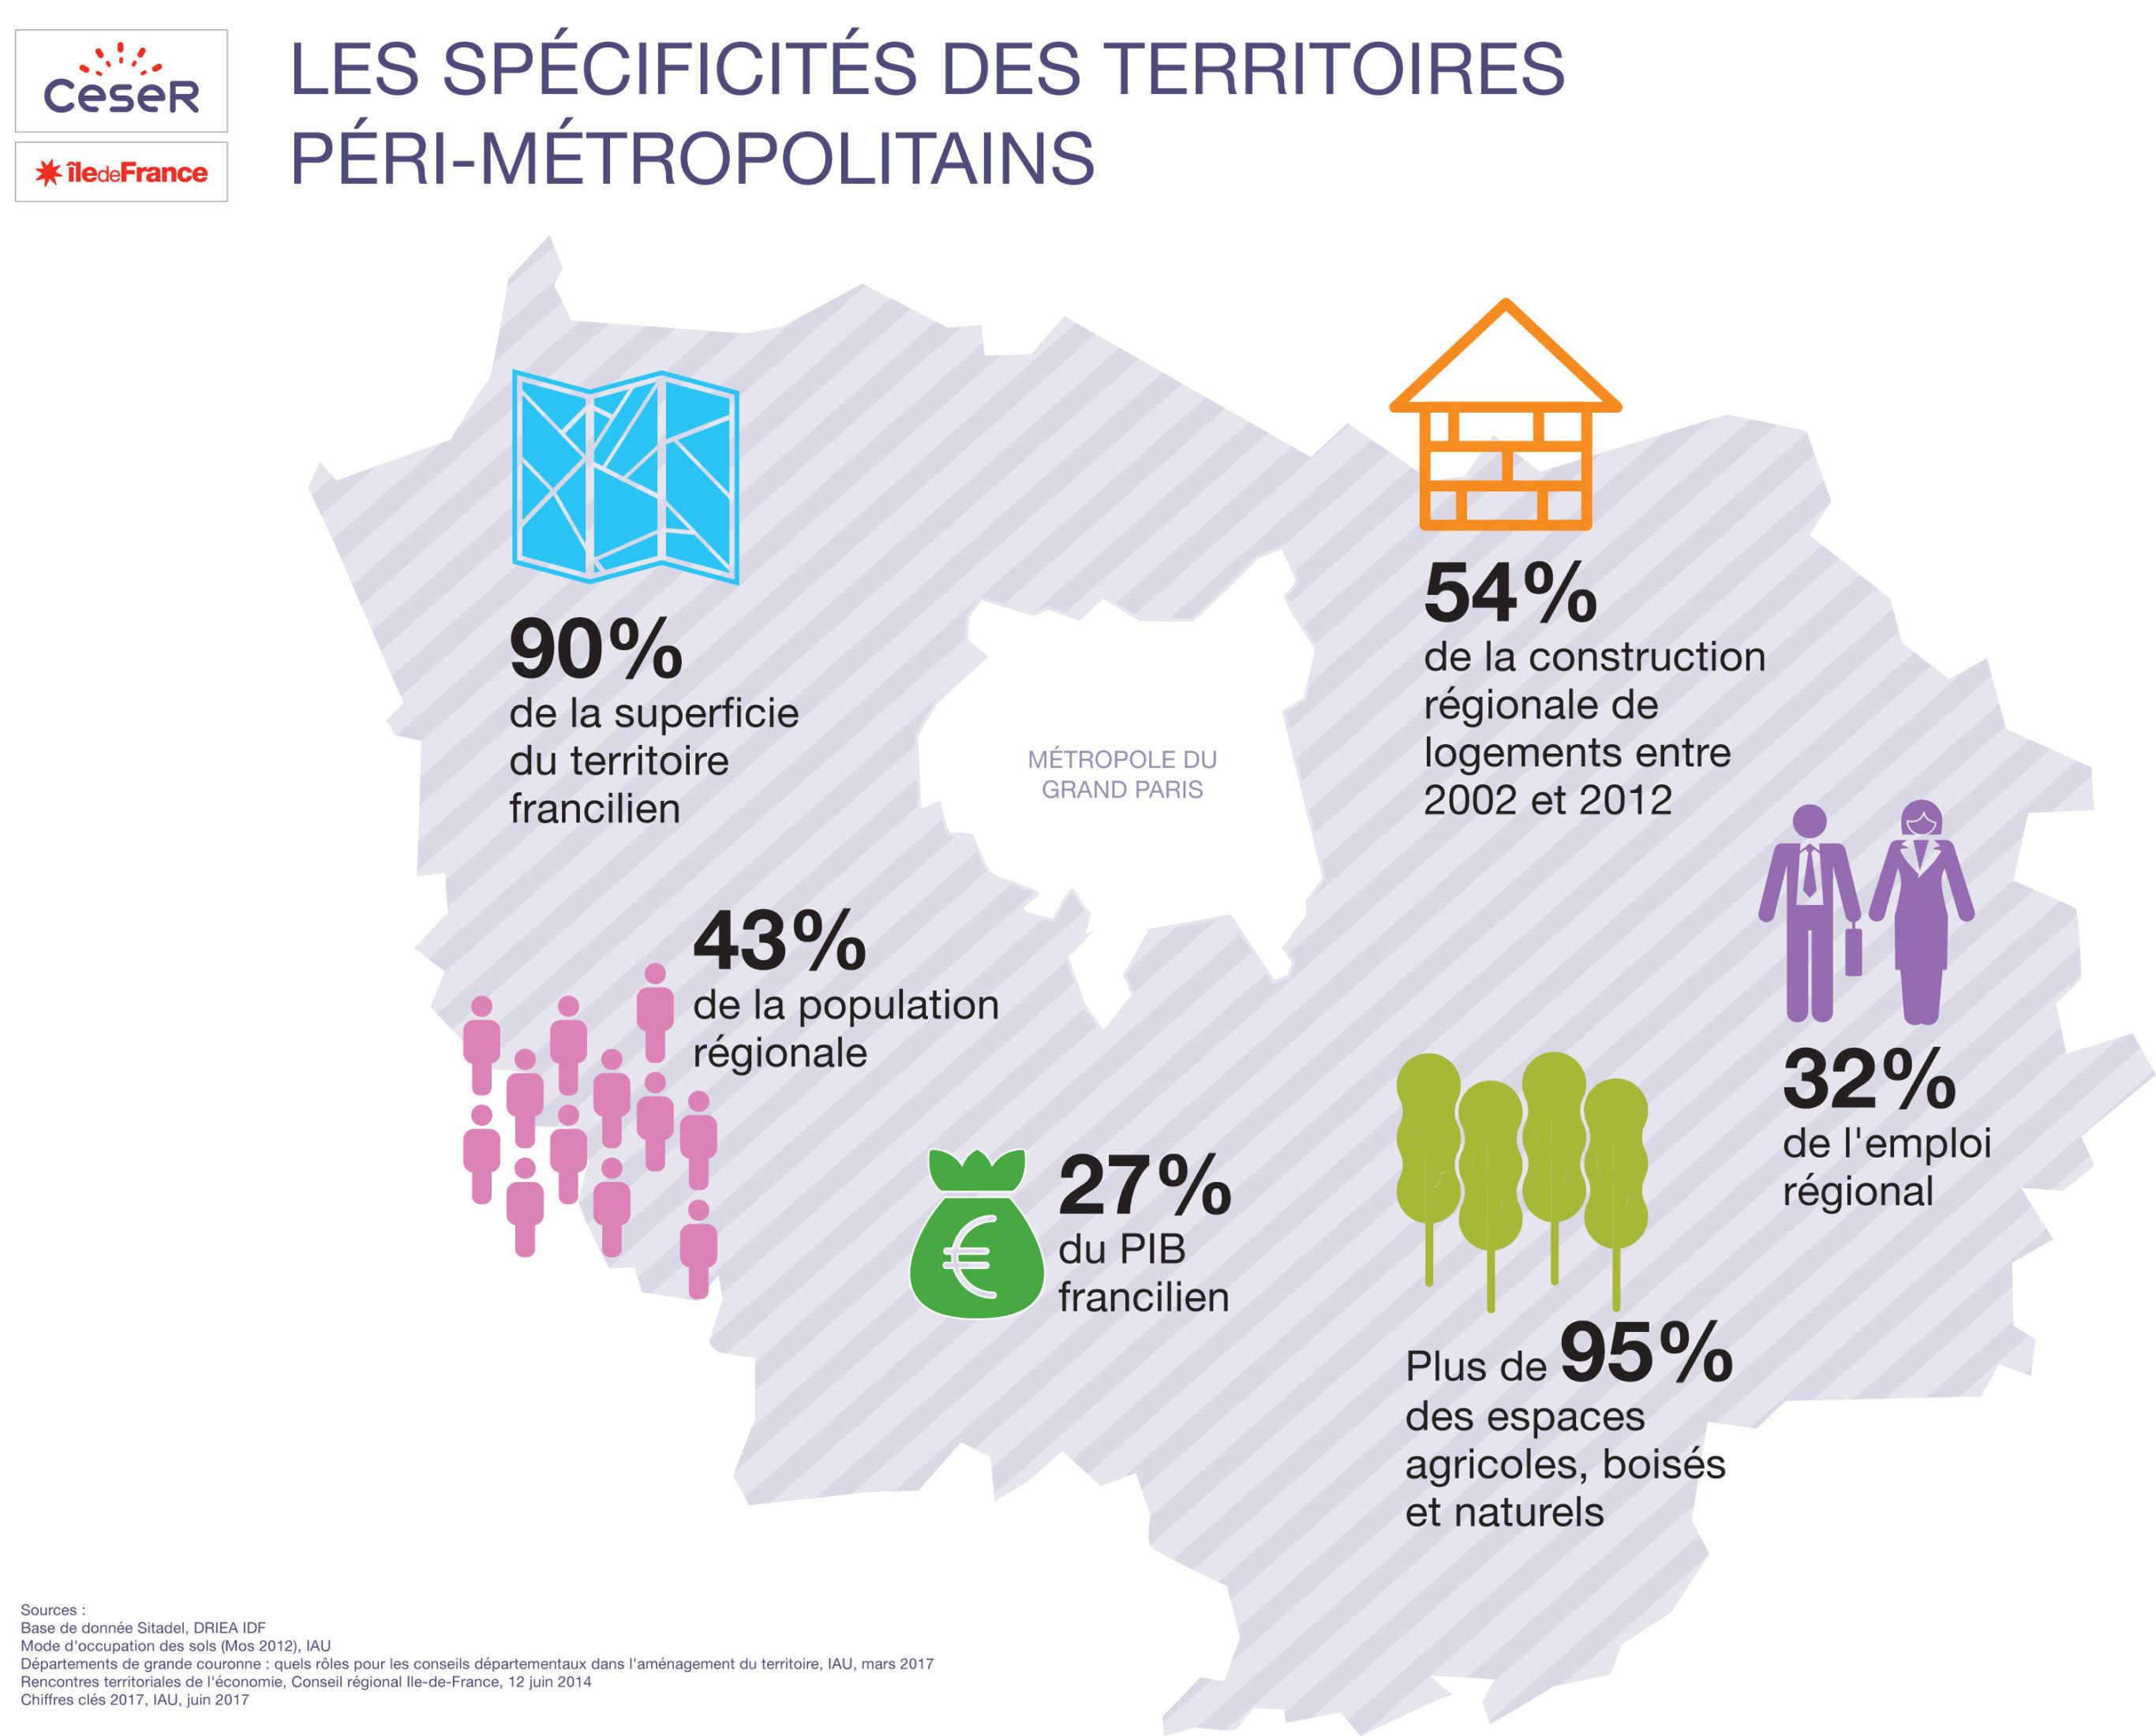 infographie_territoires_perimetropol_hd_ceseridf_juillet2017.jpg